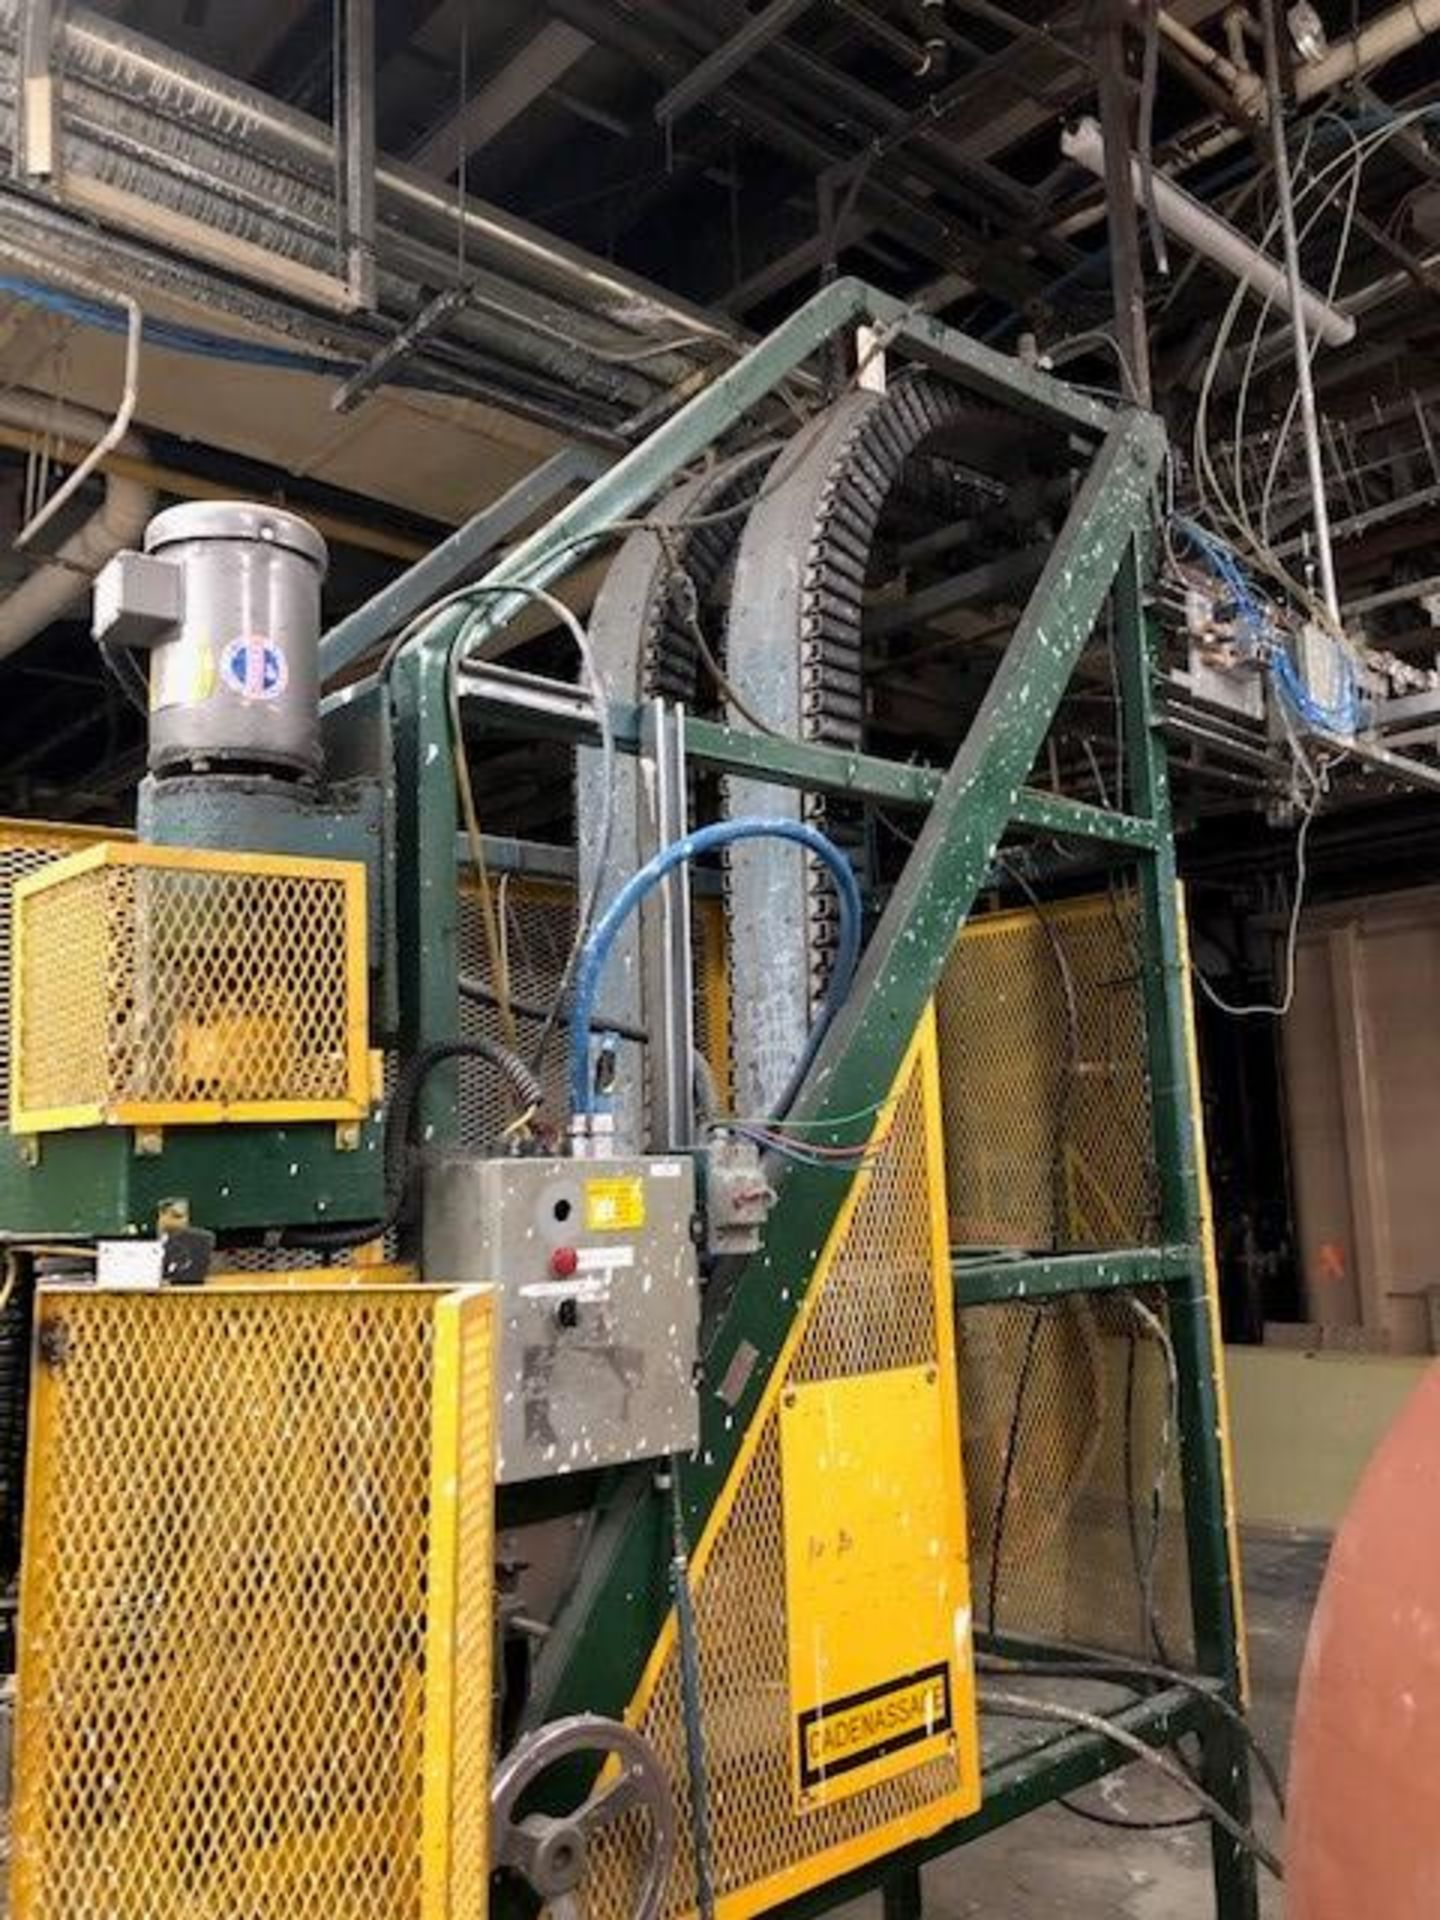 Empty gallons lowering conveyor Rago line - Image 3 of 3